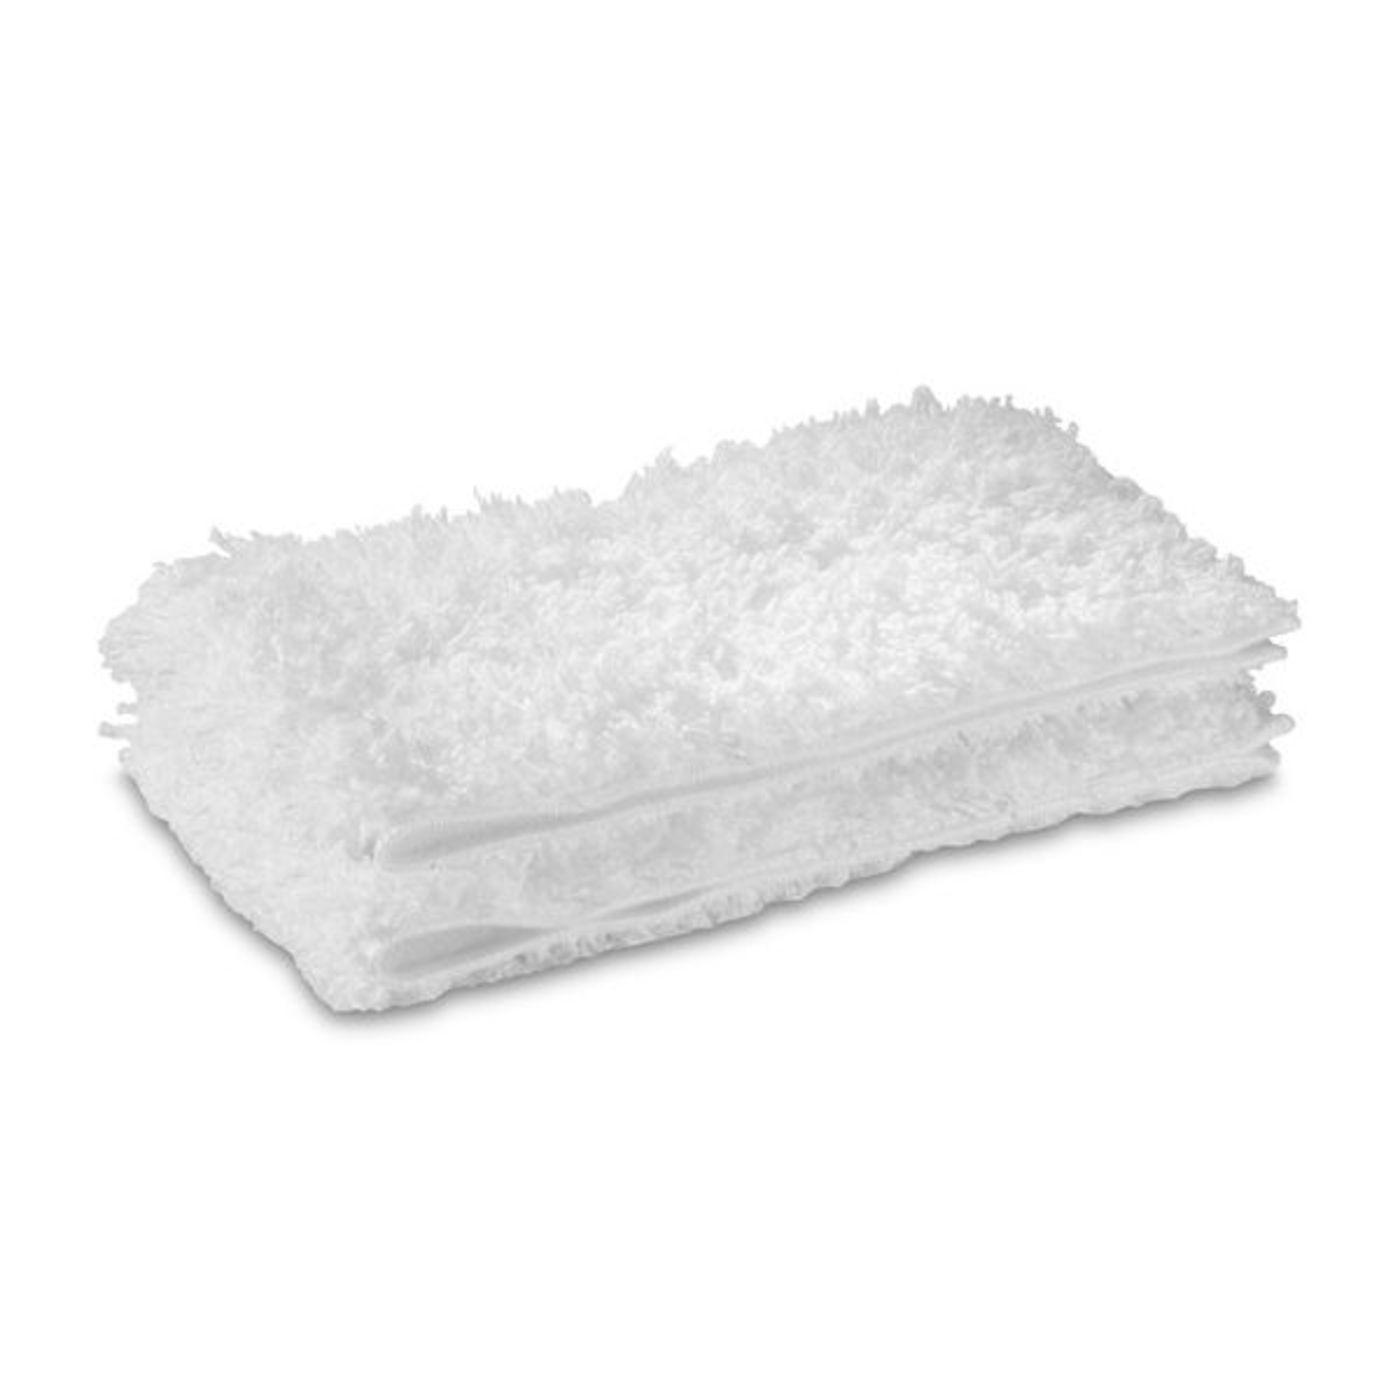 Karcher Microvezel doekenset SC 4&5 (Comfort Plus Flap) Stoomreiniger 2.863-020.0, 28630200